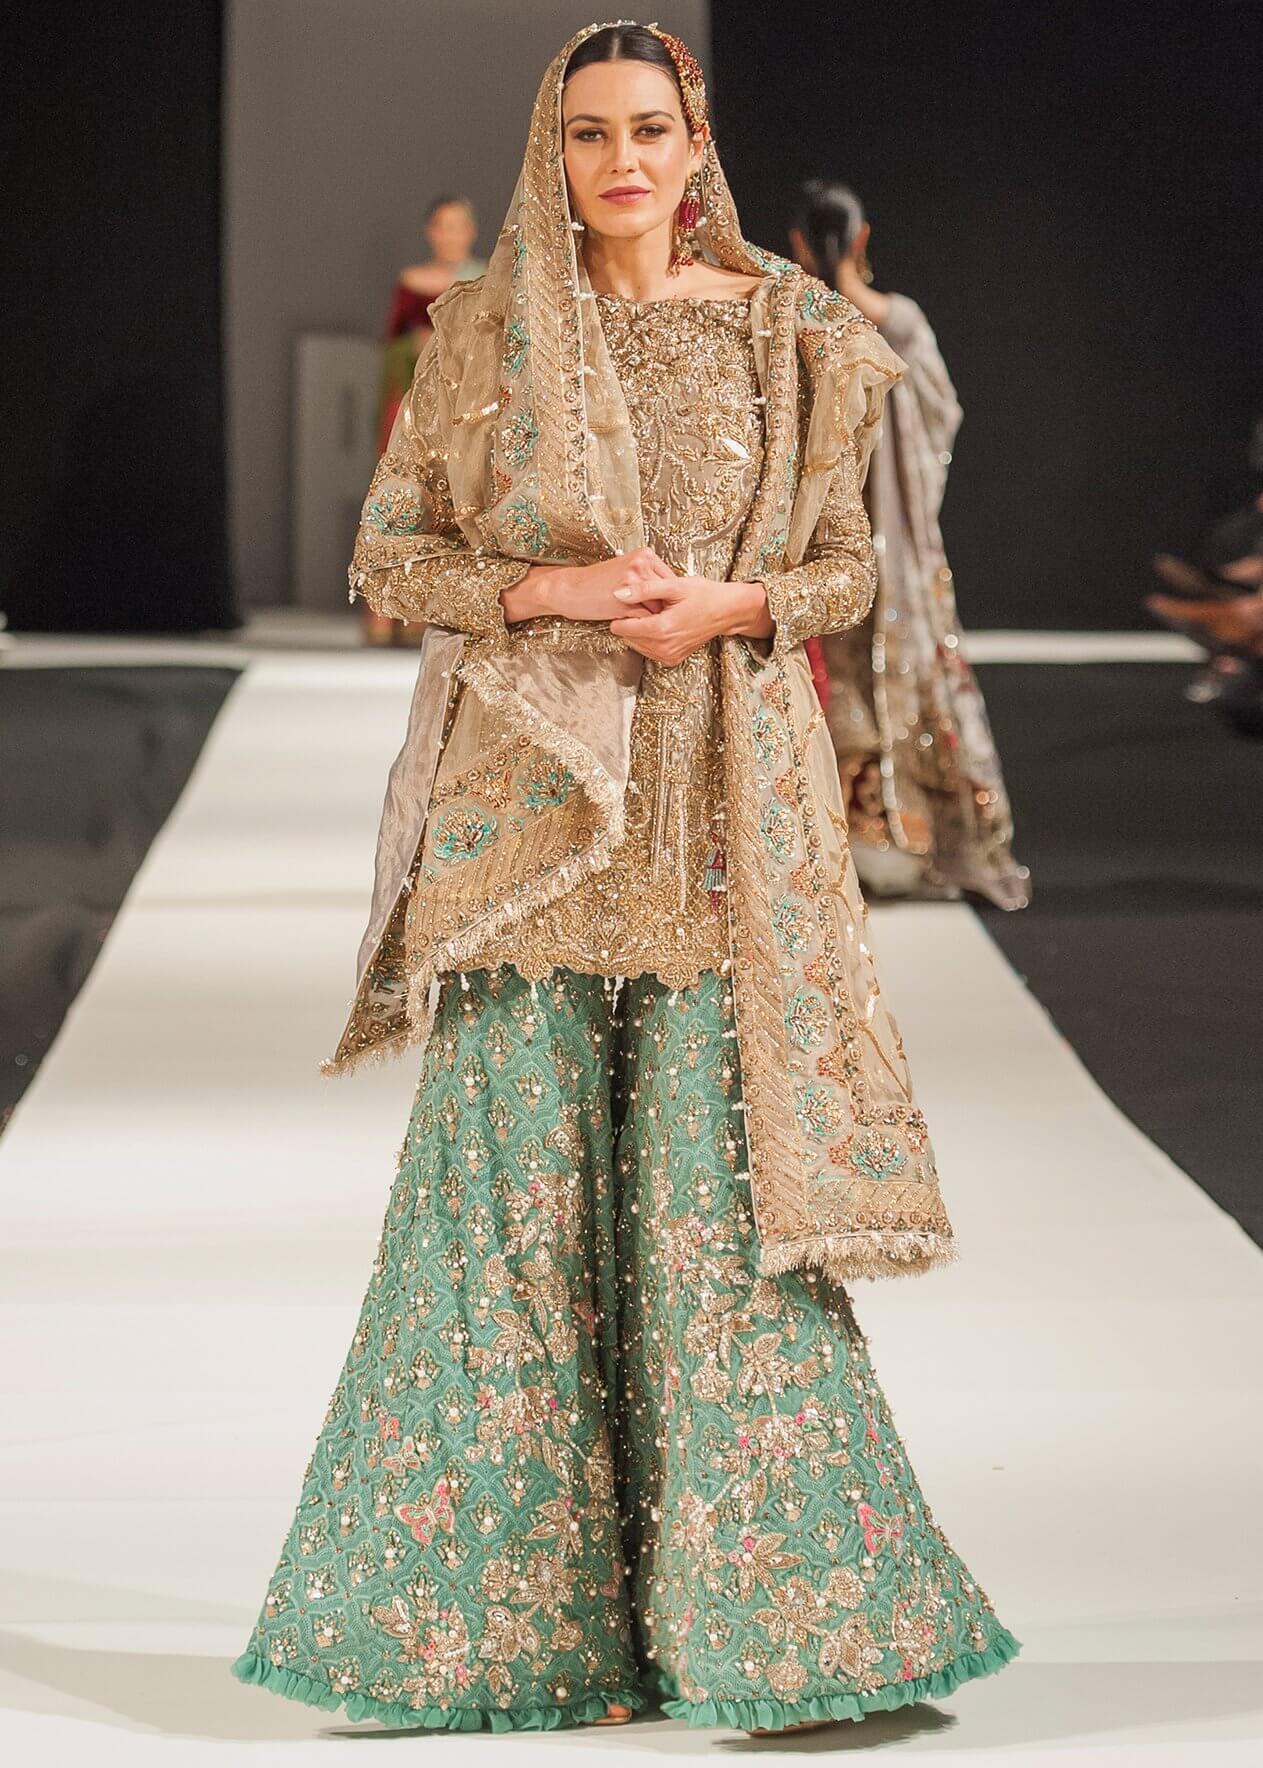 Virbant Color Combination Bridal Dress by Mohsin Ranjha for Pakistani Bride